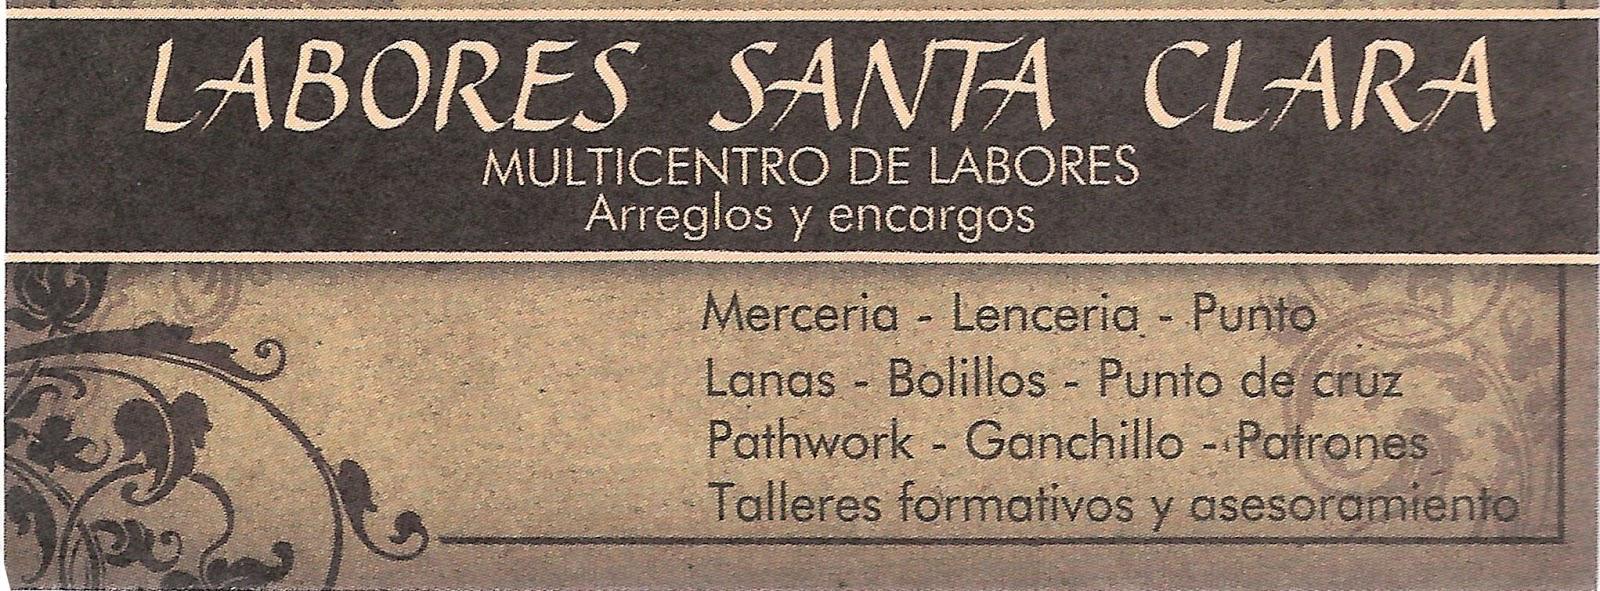 https://www.facebook.com/LaboresSantaClara?fref=ts